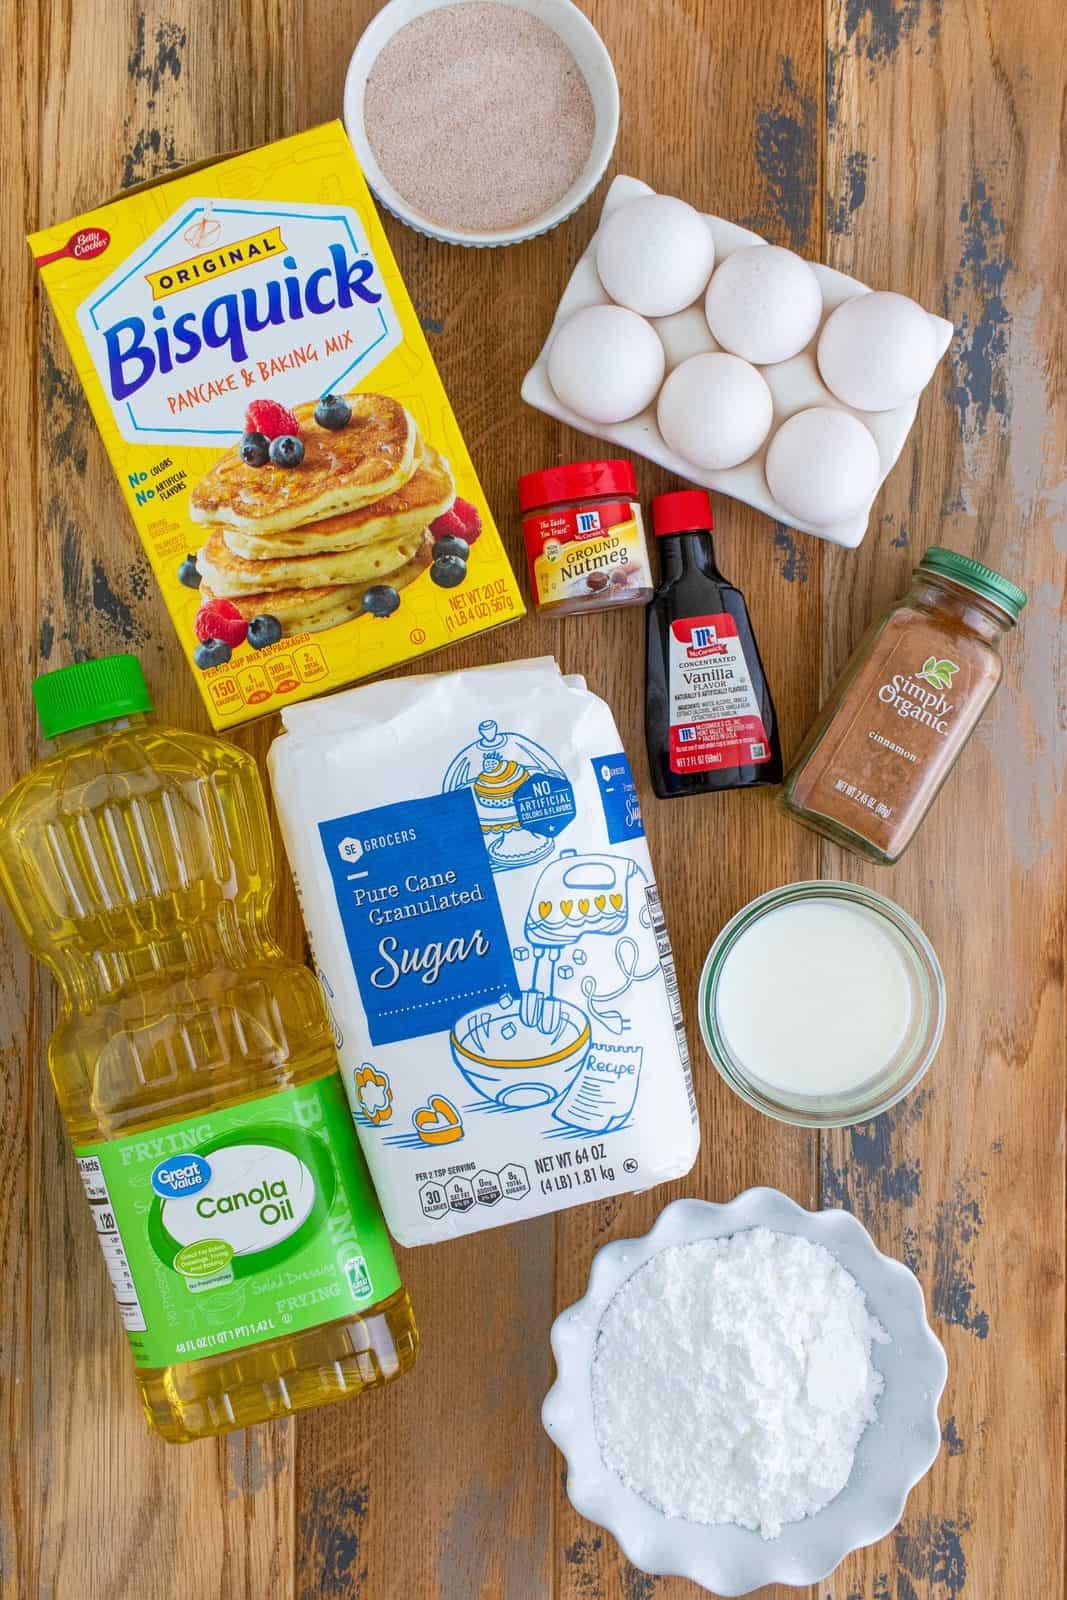 pancake mix sugar ground cinnamon ground nutmeg eggs milk oil powdered sugar vanilla extract.